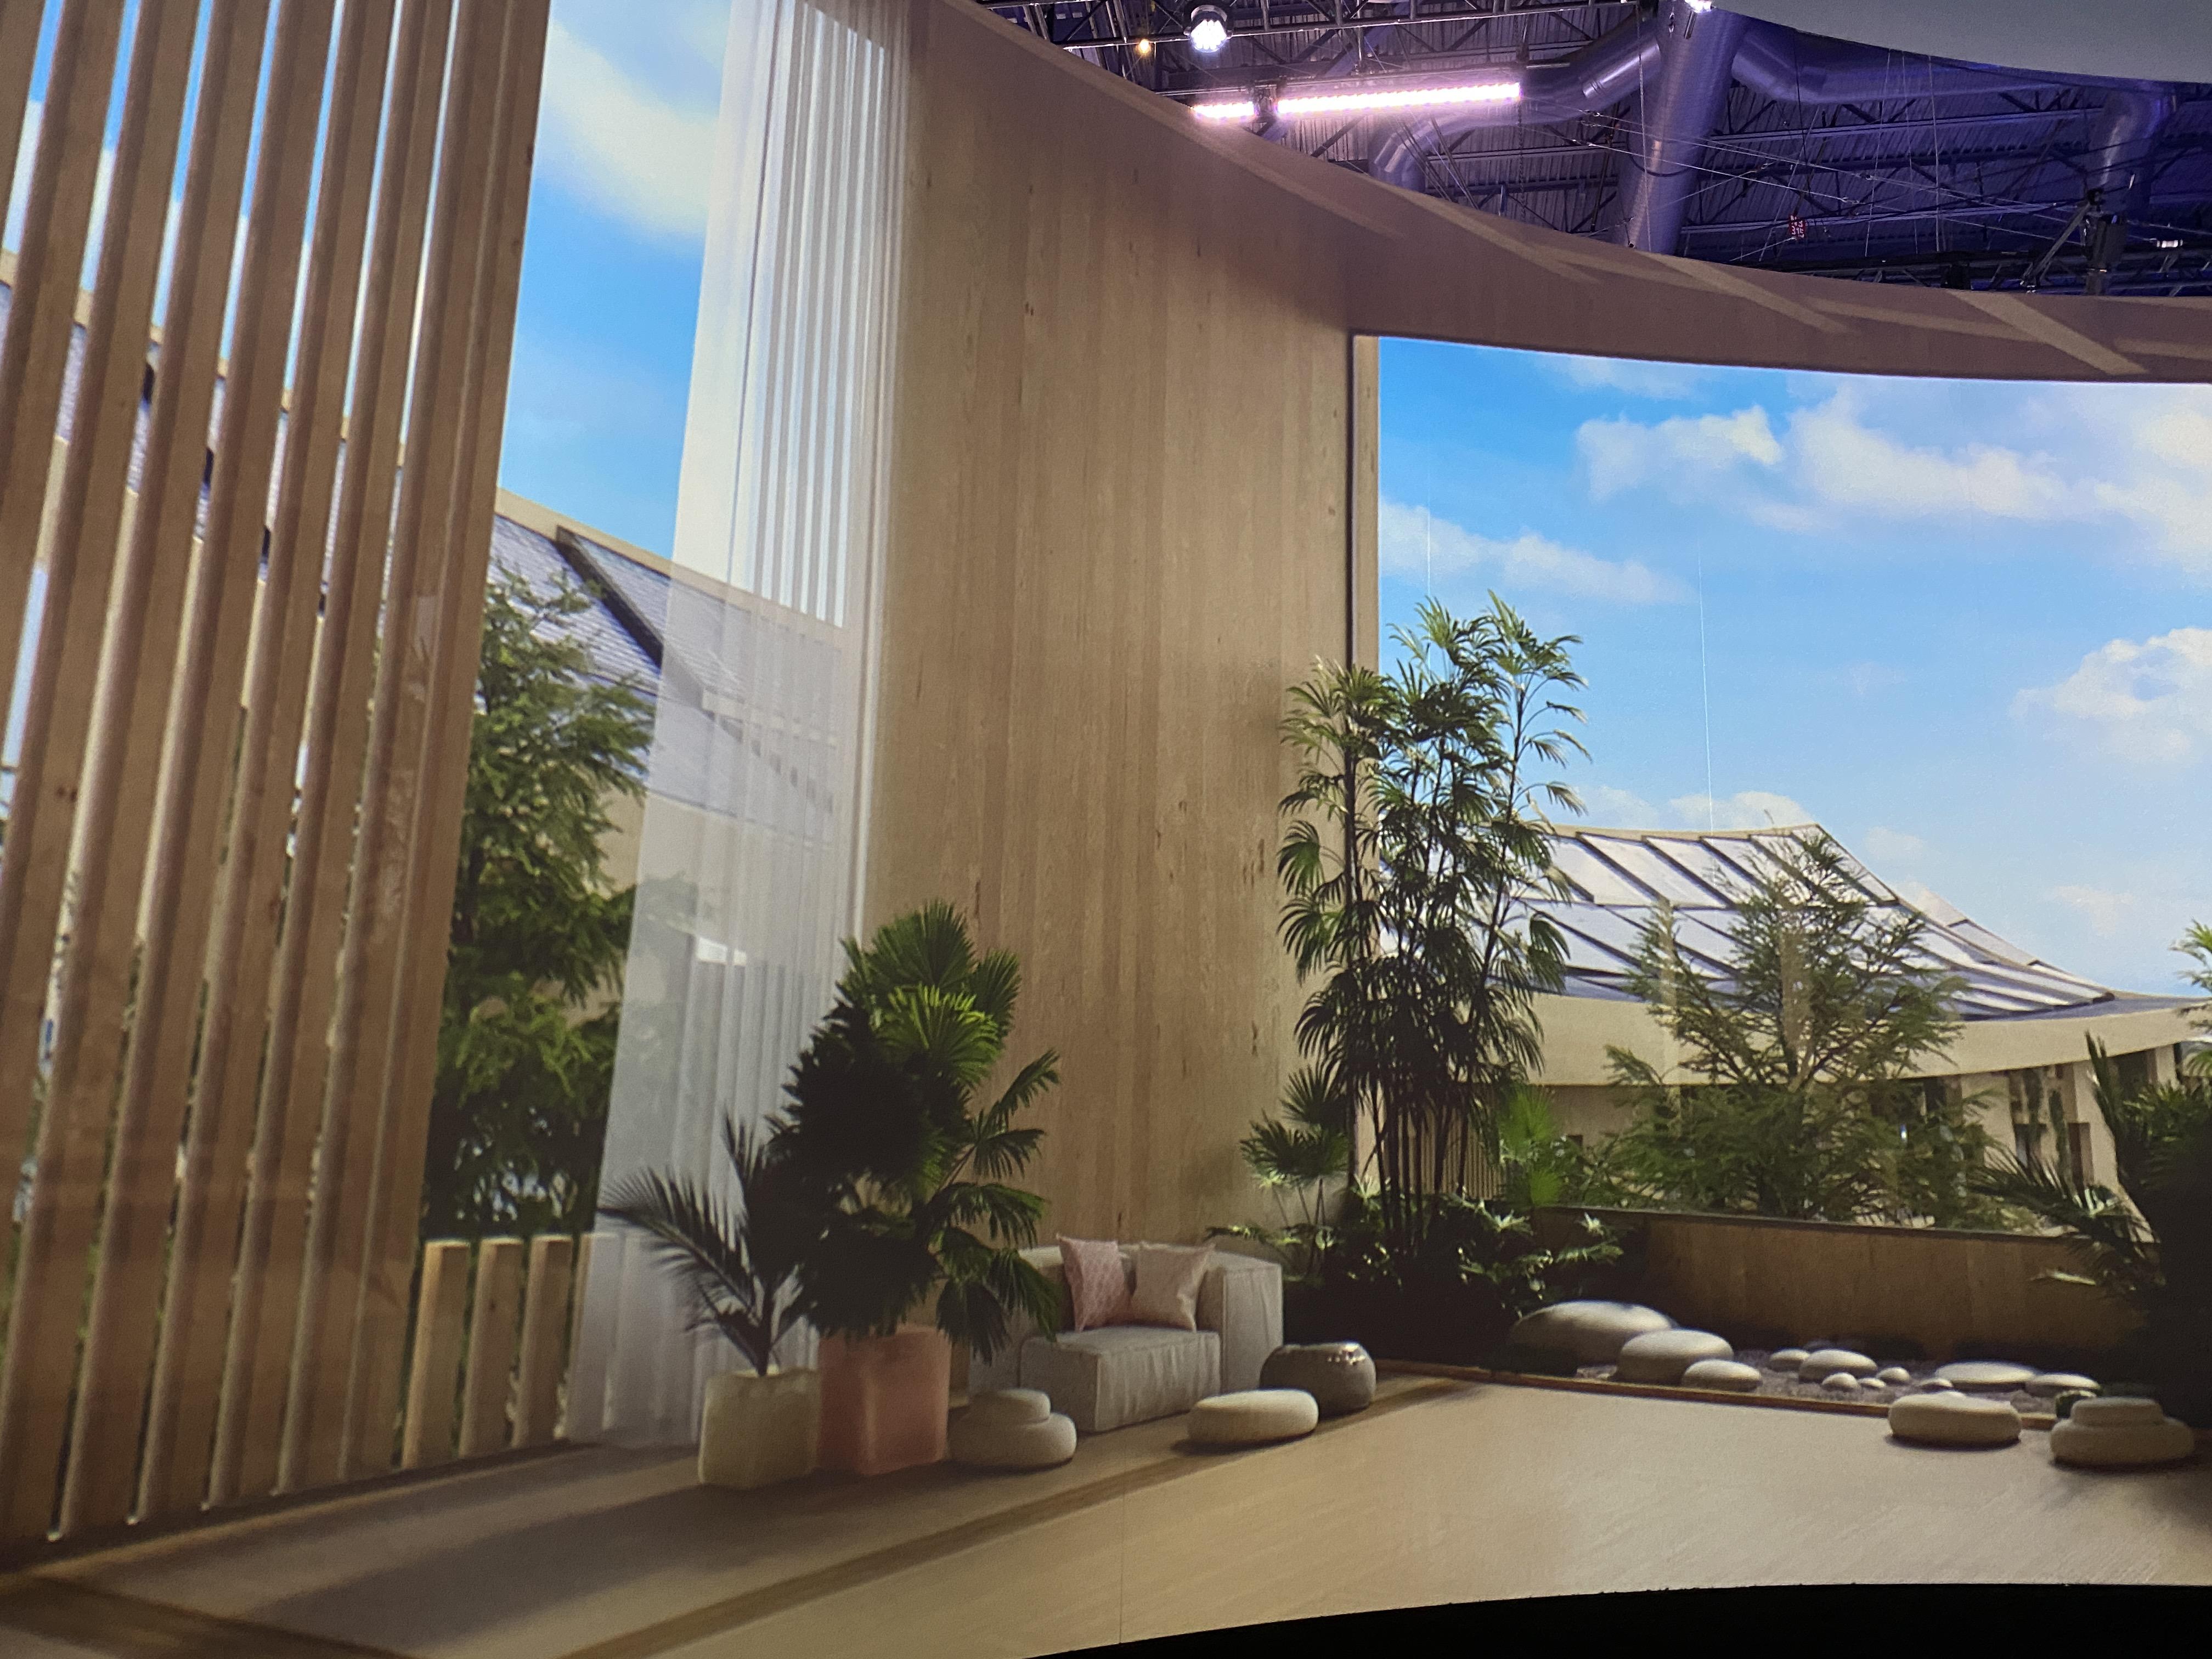 Toyota Woven City CES 2020